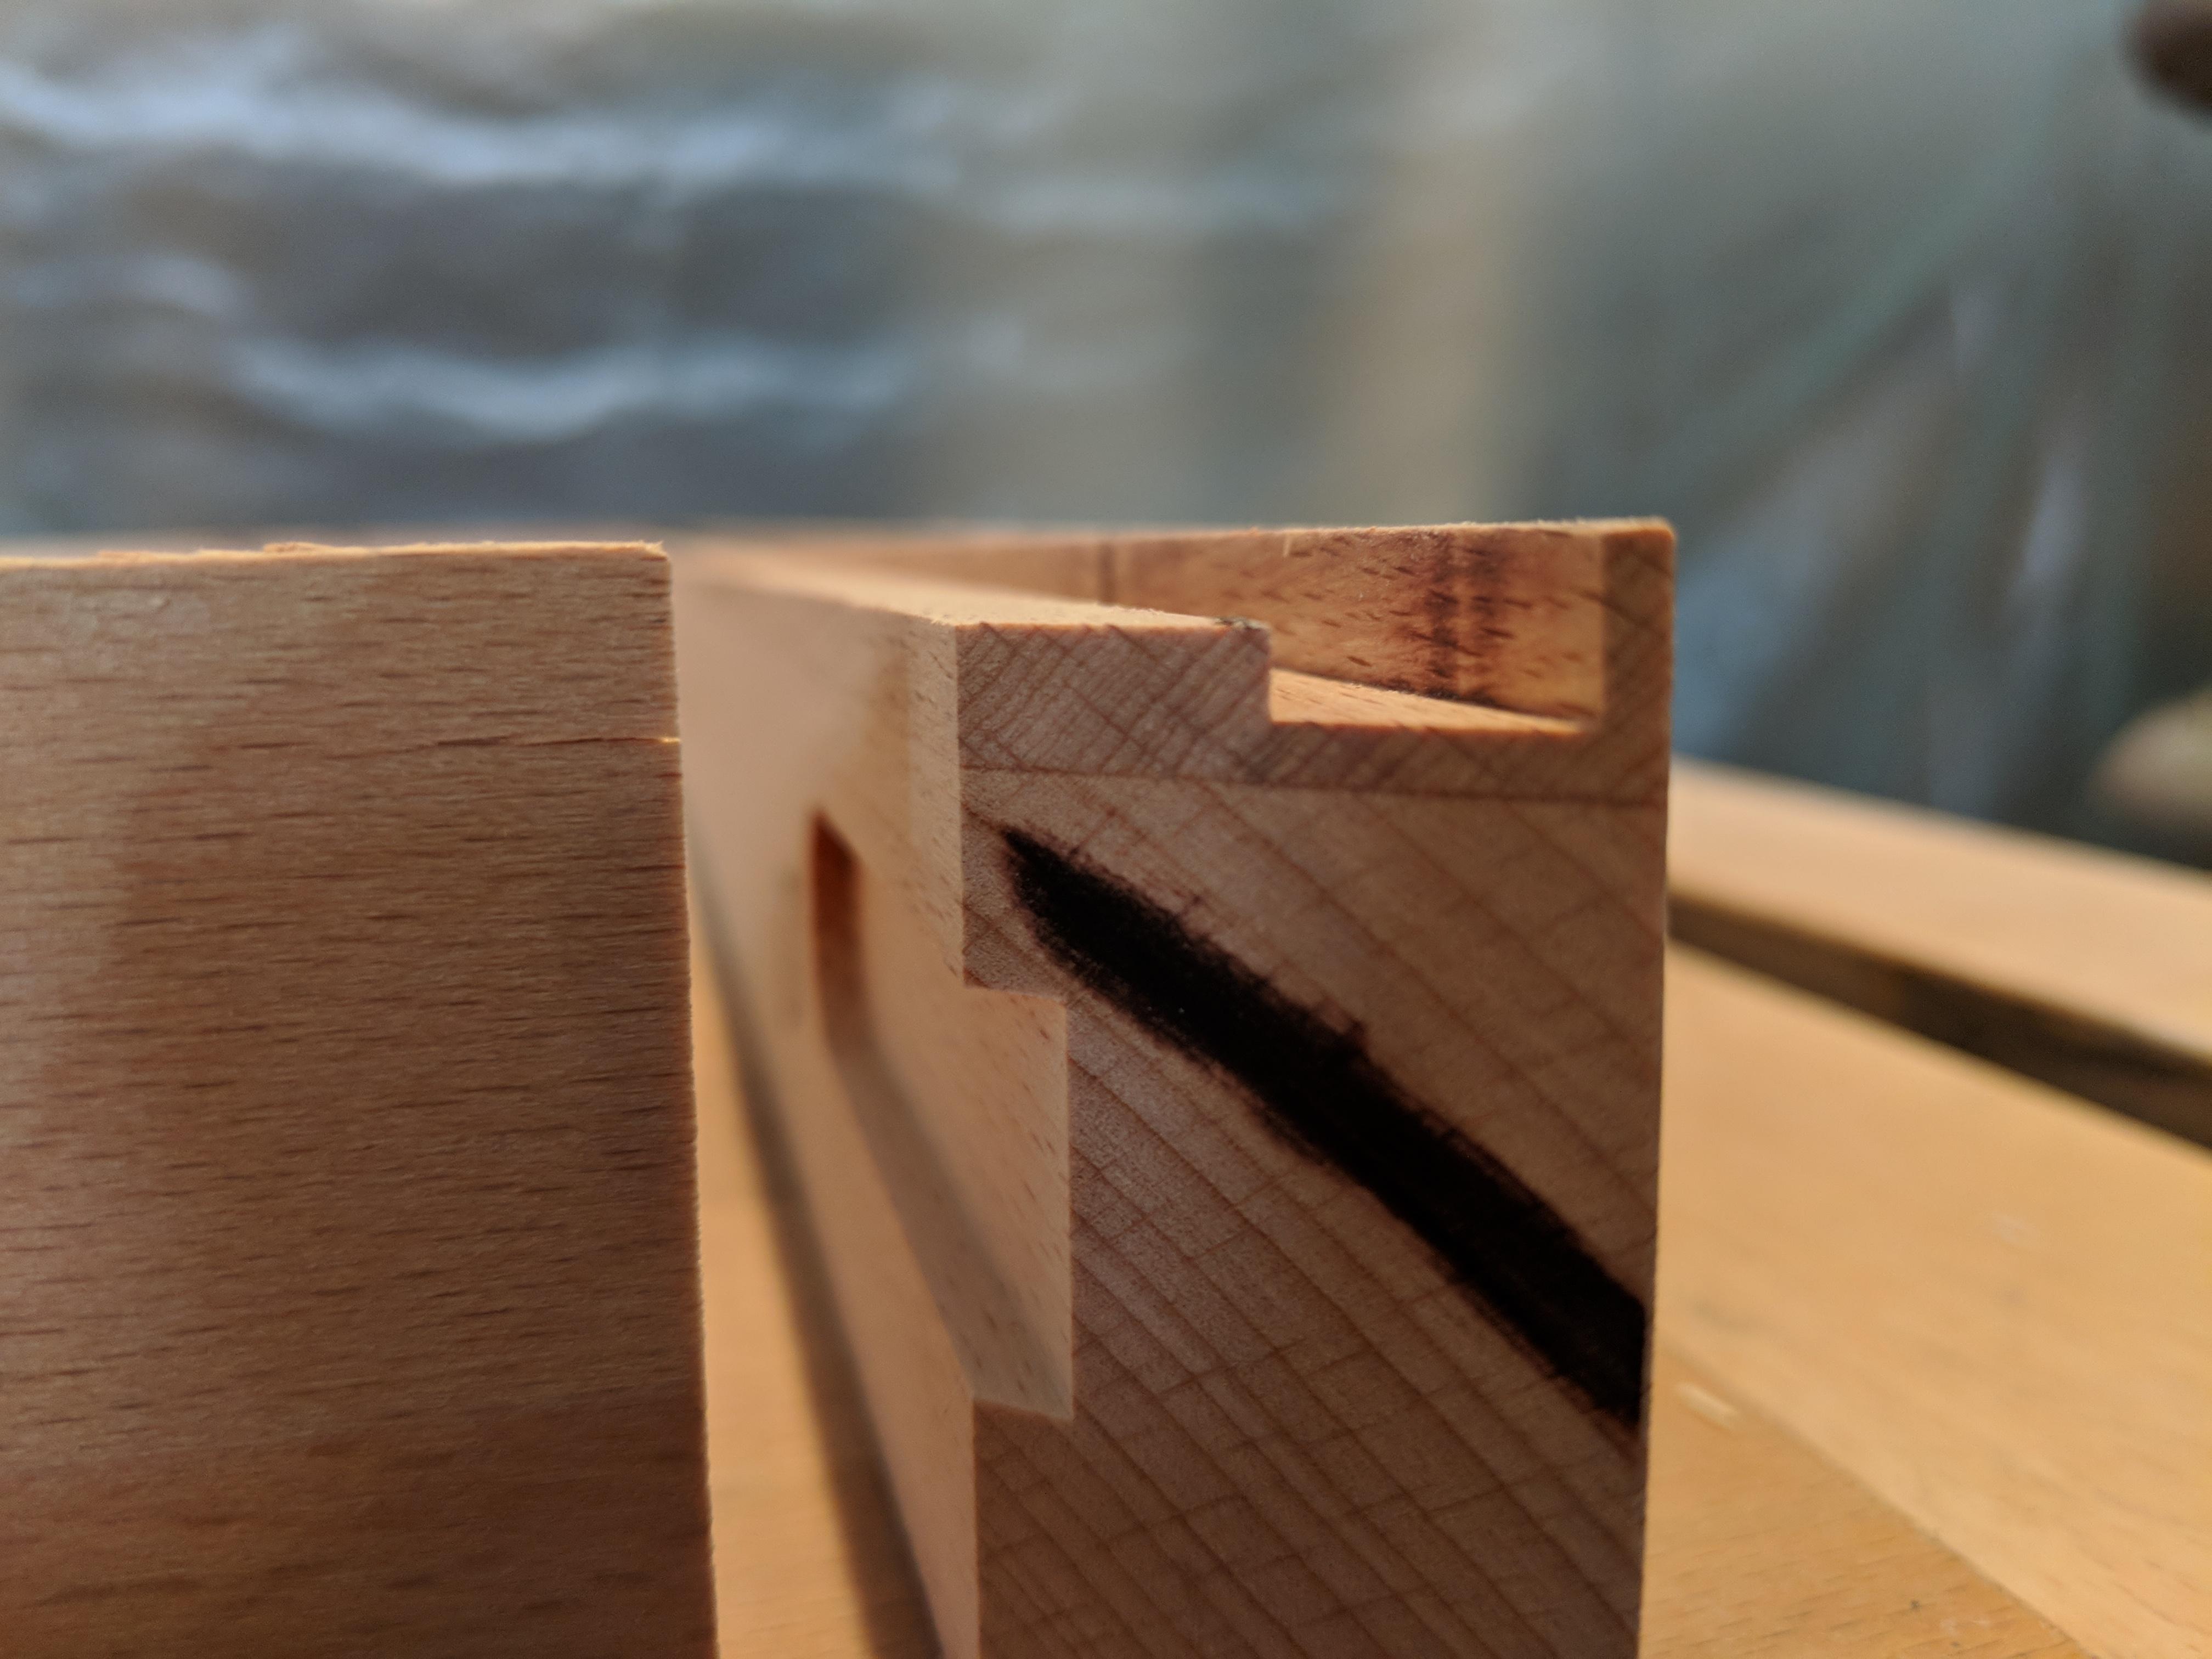 Fräsung für Silikonfuge/Milling groove for silicone joint